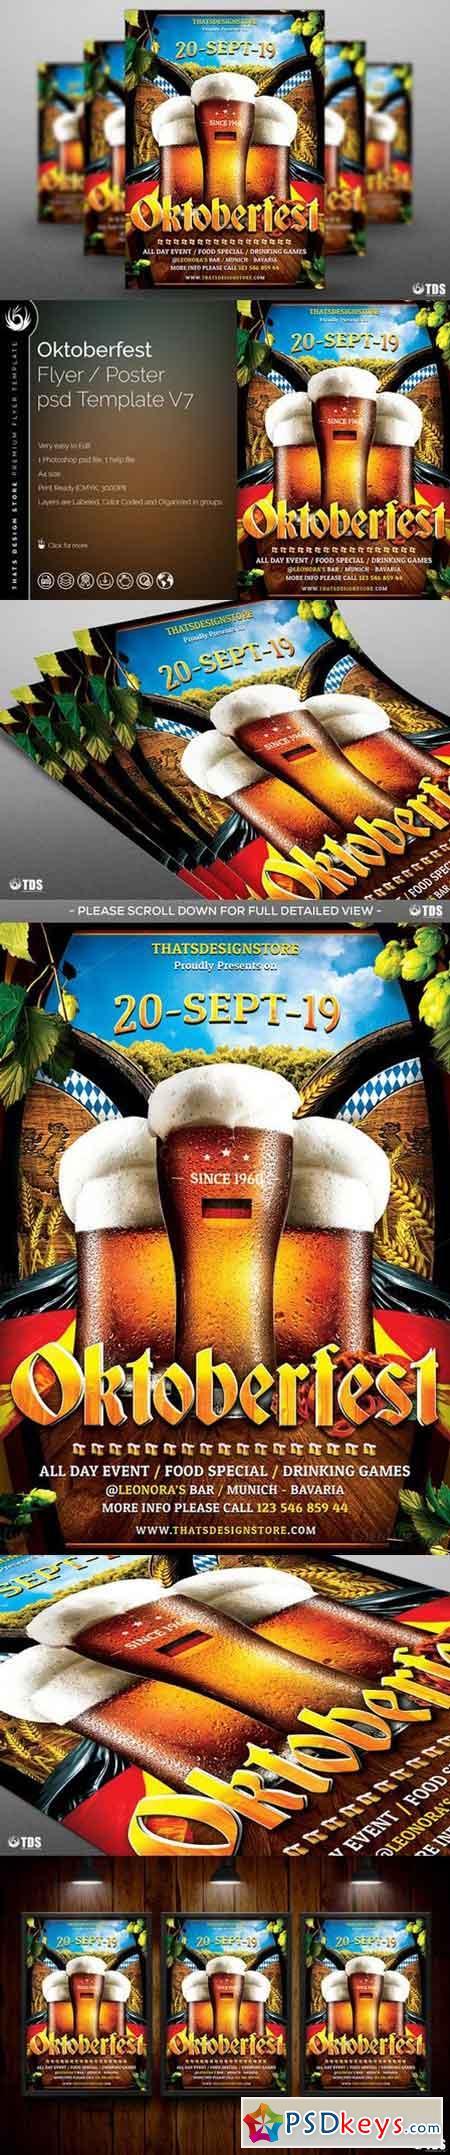 Oktoberfest Flyer Template V7 841710